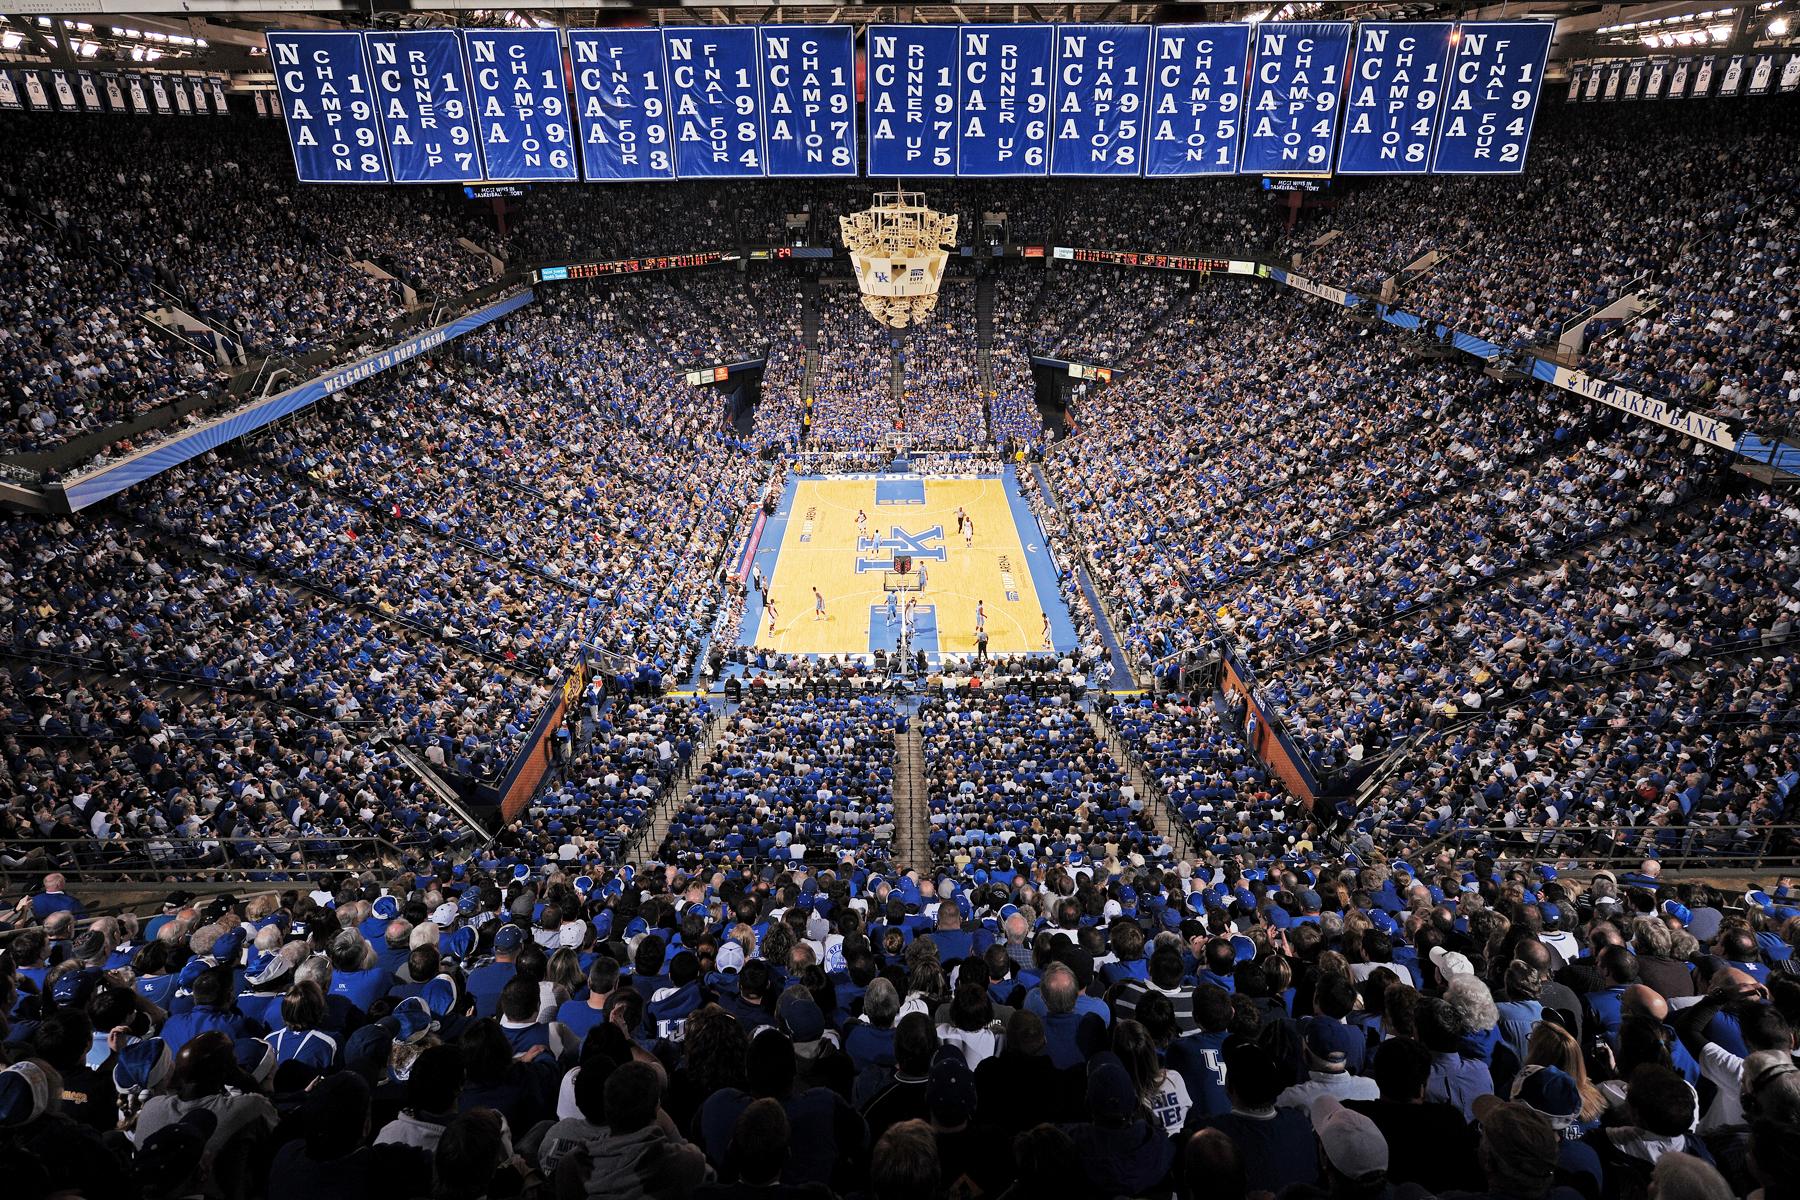 Duke Basketball Hd Wallpaper Hd Wallpapers 1800x1200